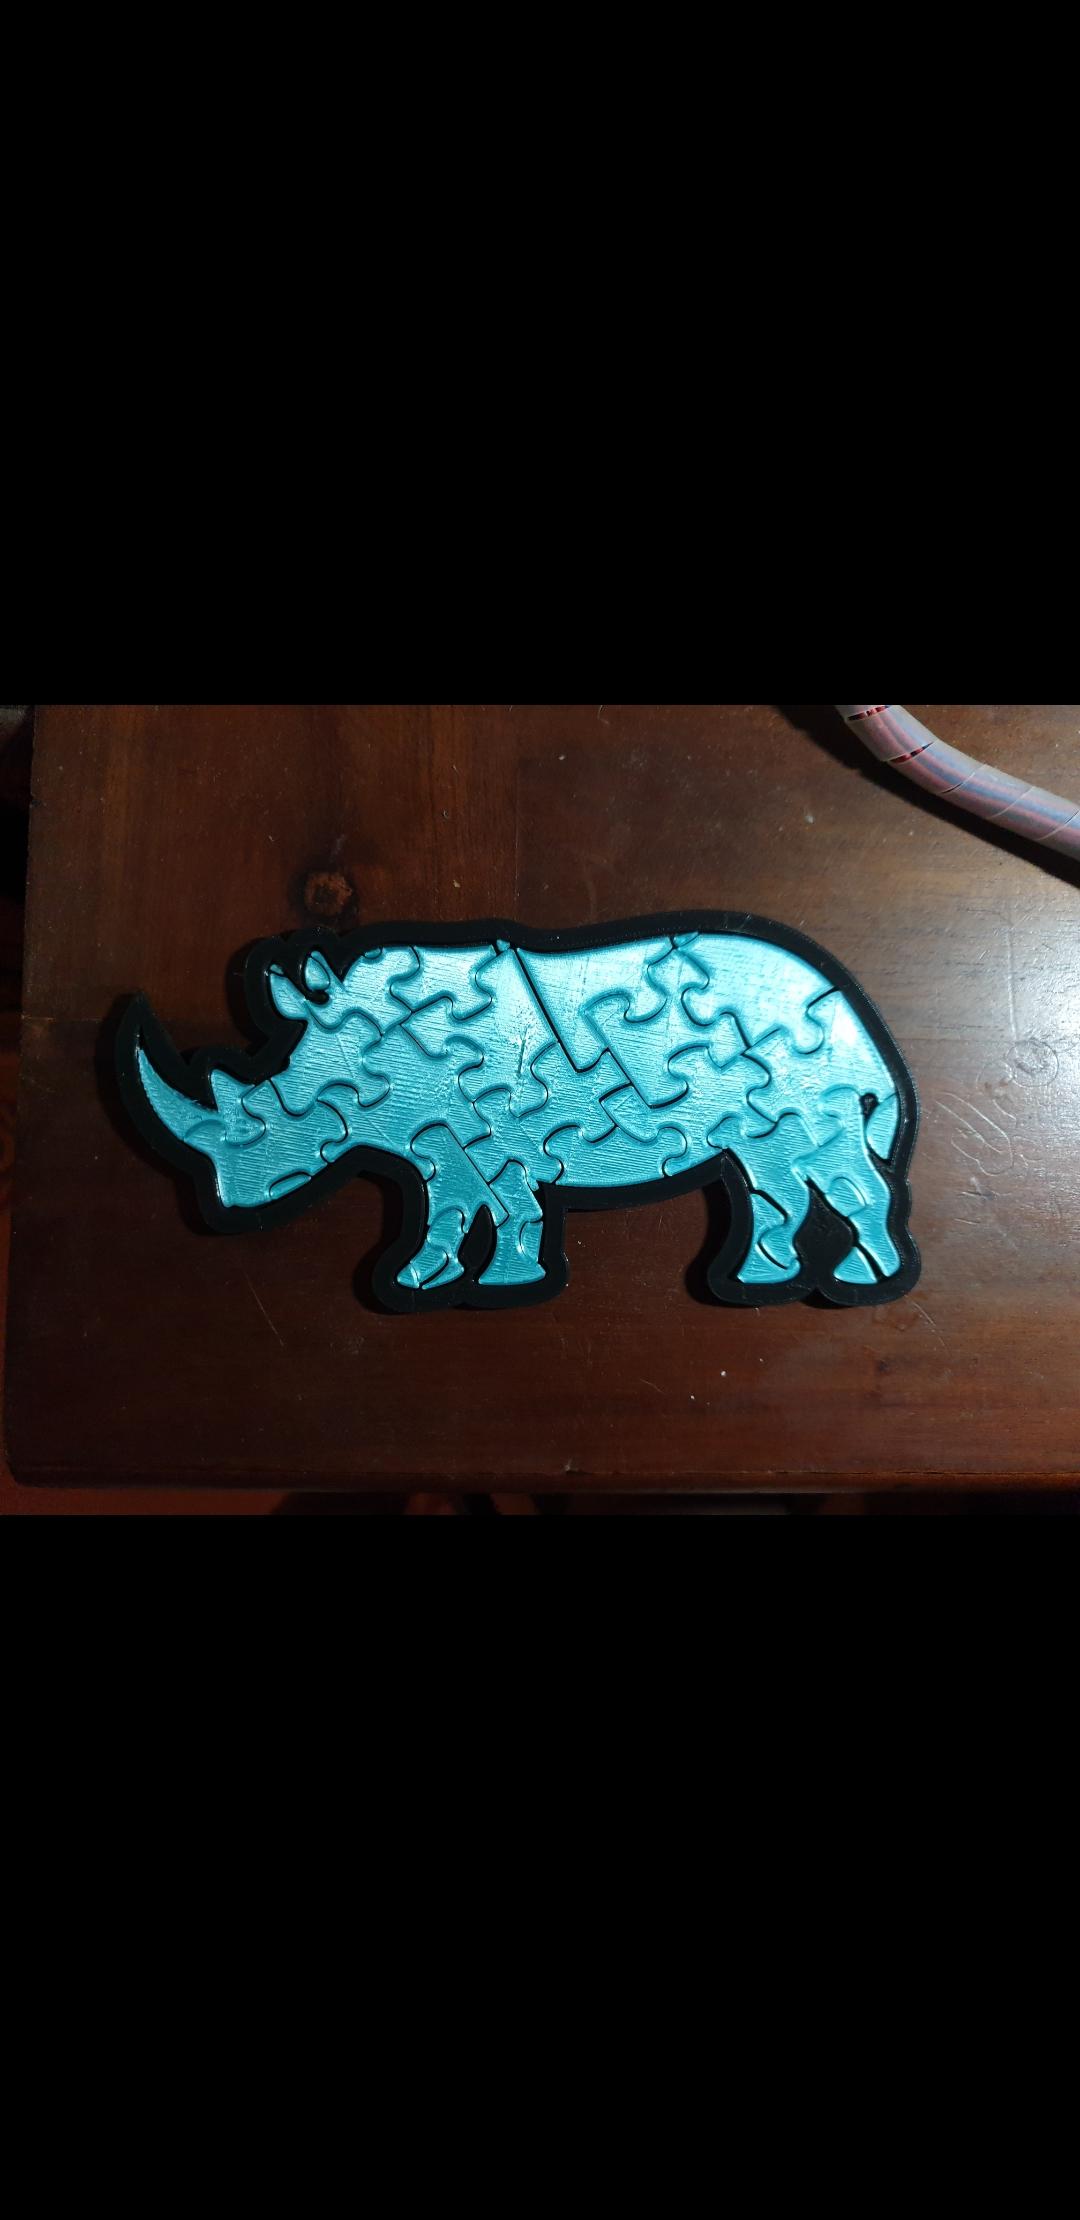 Screenshot_20190930-123514_Gallery.jpg Download free STL file Rhinoceros Puzzle • Template to 3D print, Renee_Taylor